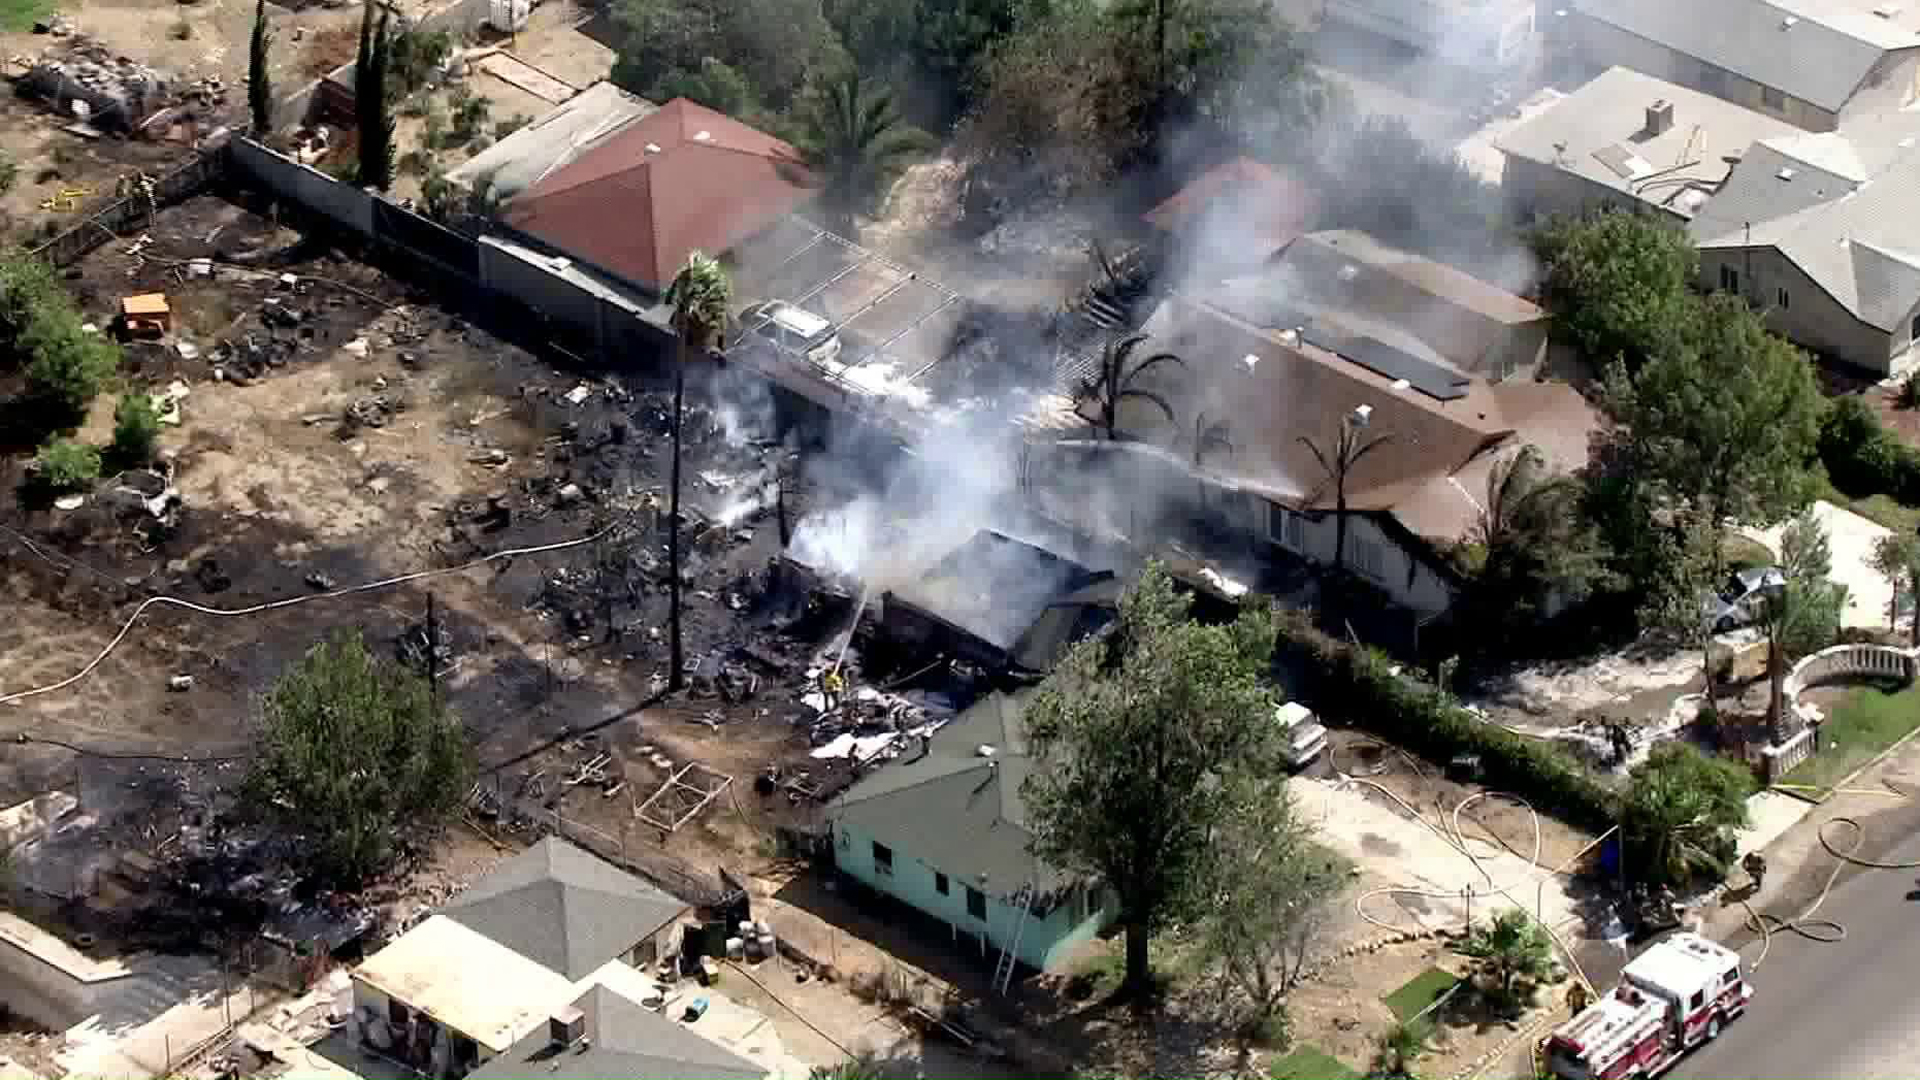 A wind-driven blaze in Fontana burned multiple homes on Oct. 10, 2019. (Credit: KTLA)